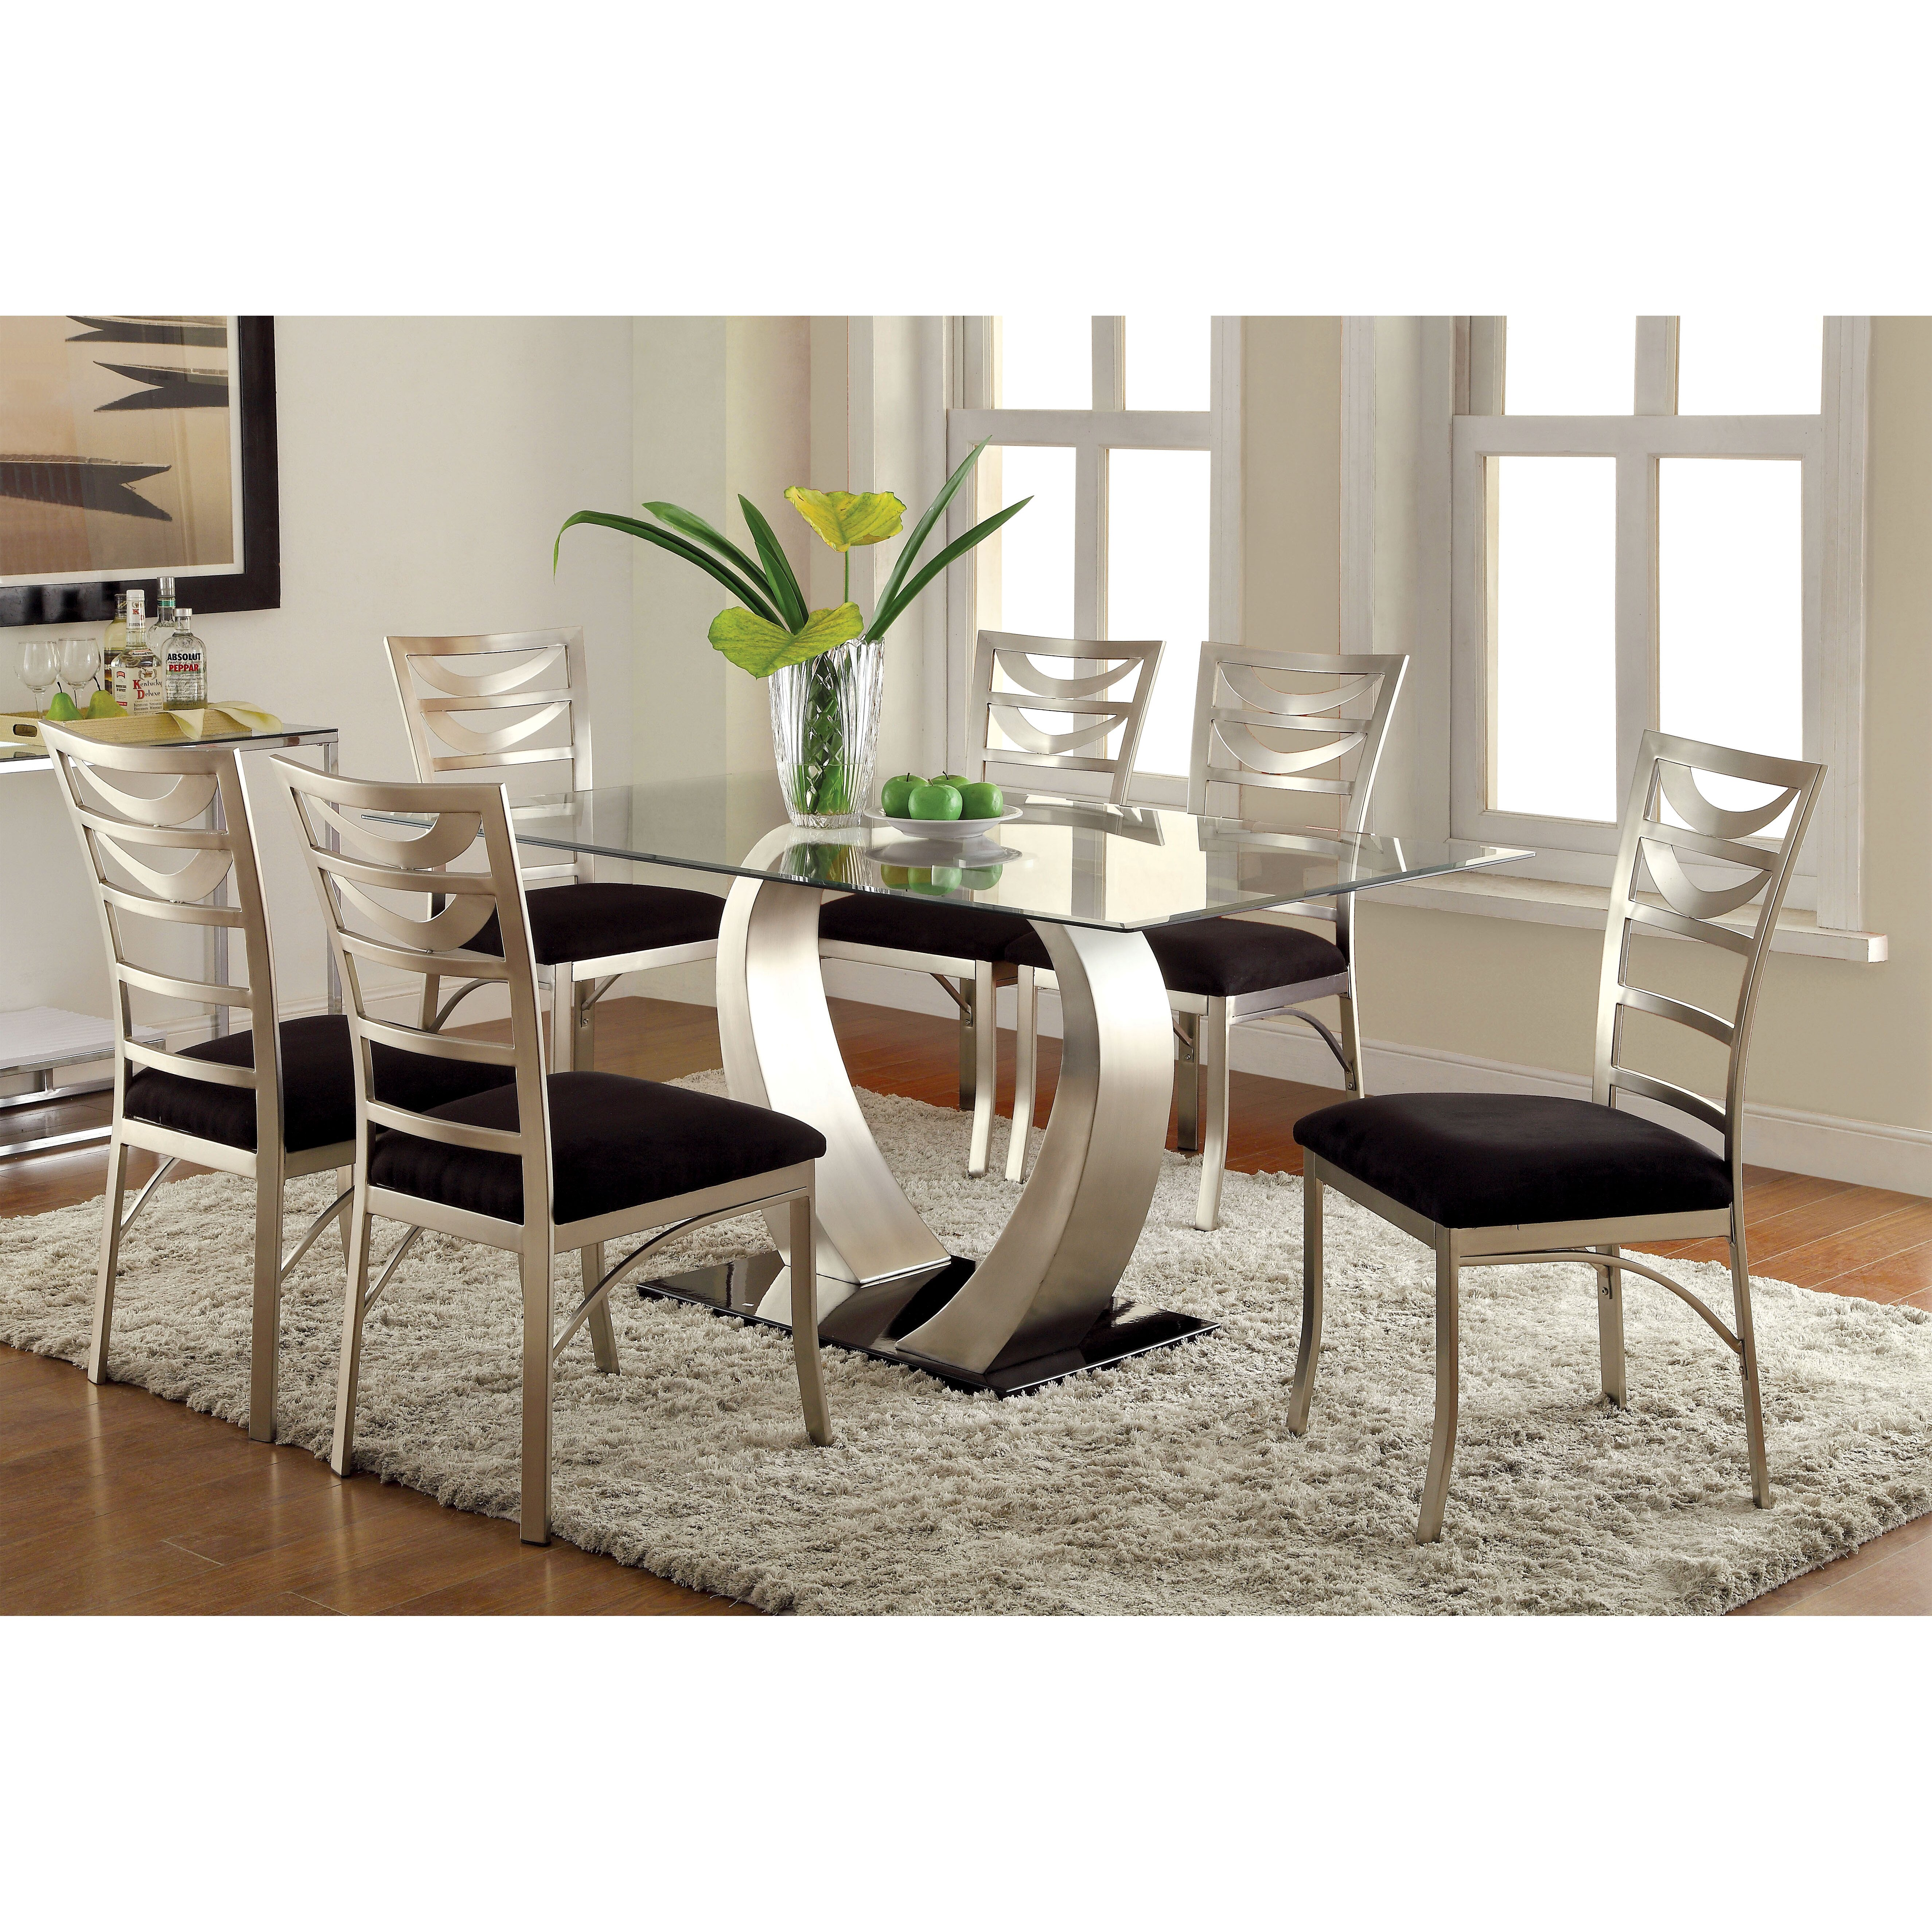 Hokku designs briles dining table reviews for Hokku designs dining room furniture